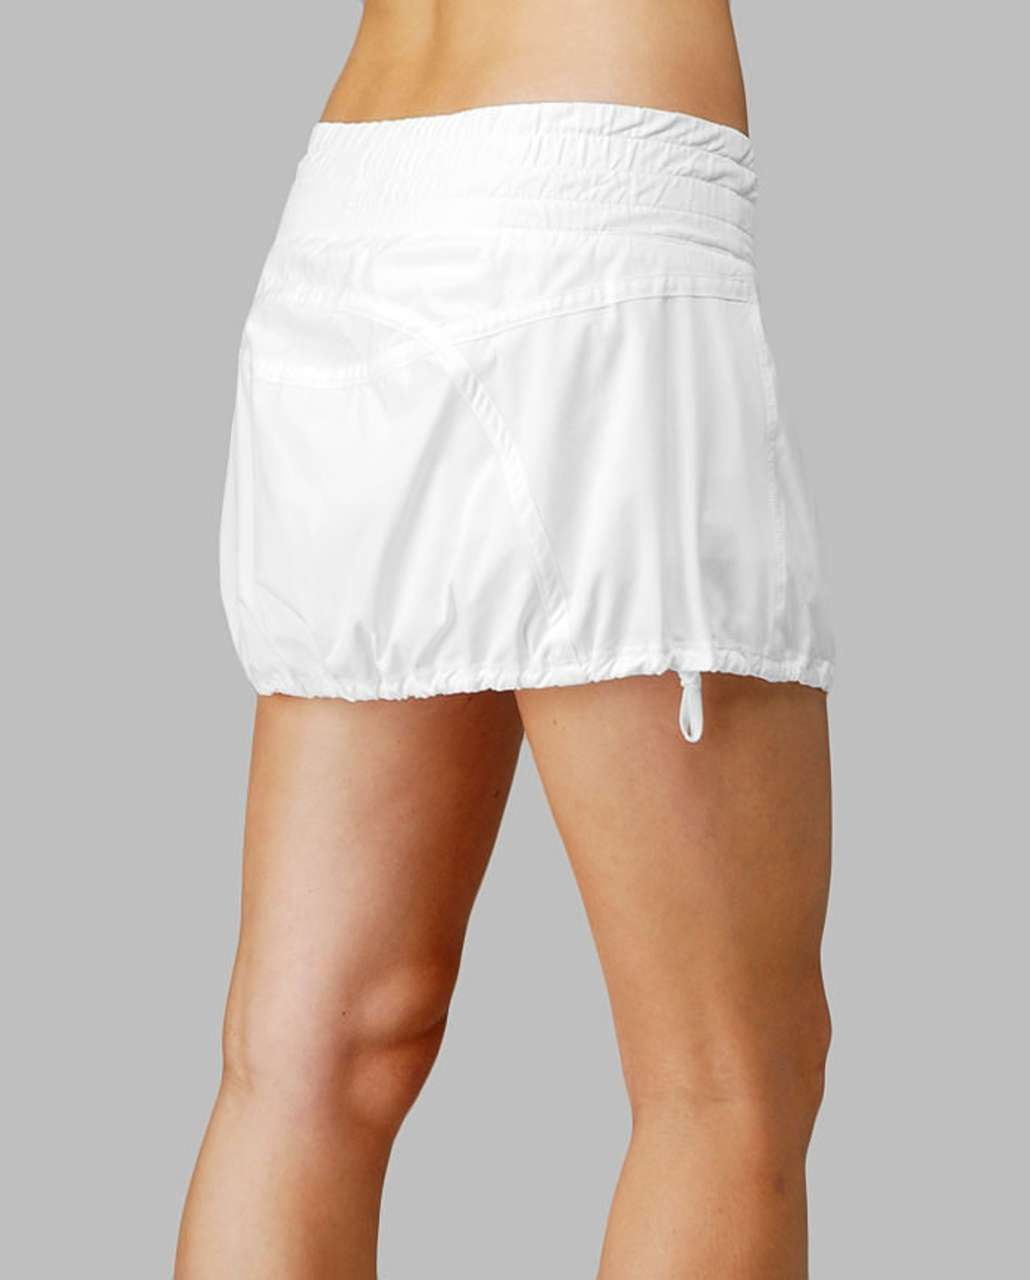 2dcd451bea Lululemon Run Tracker Skirt - White - lulu fanatics